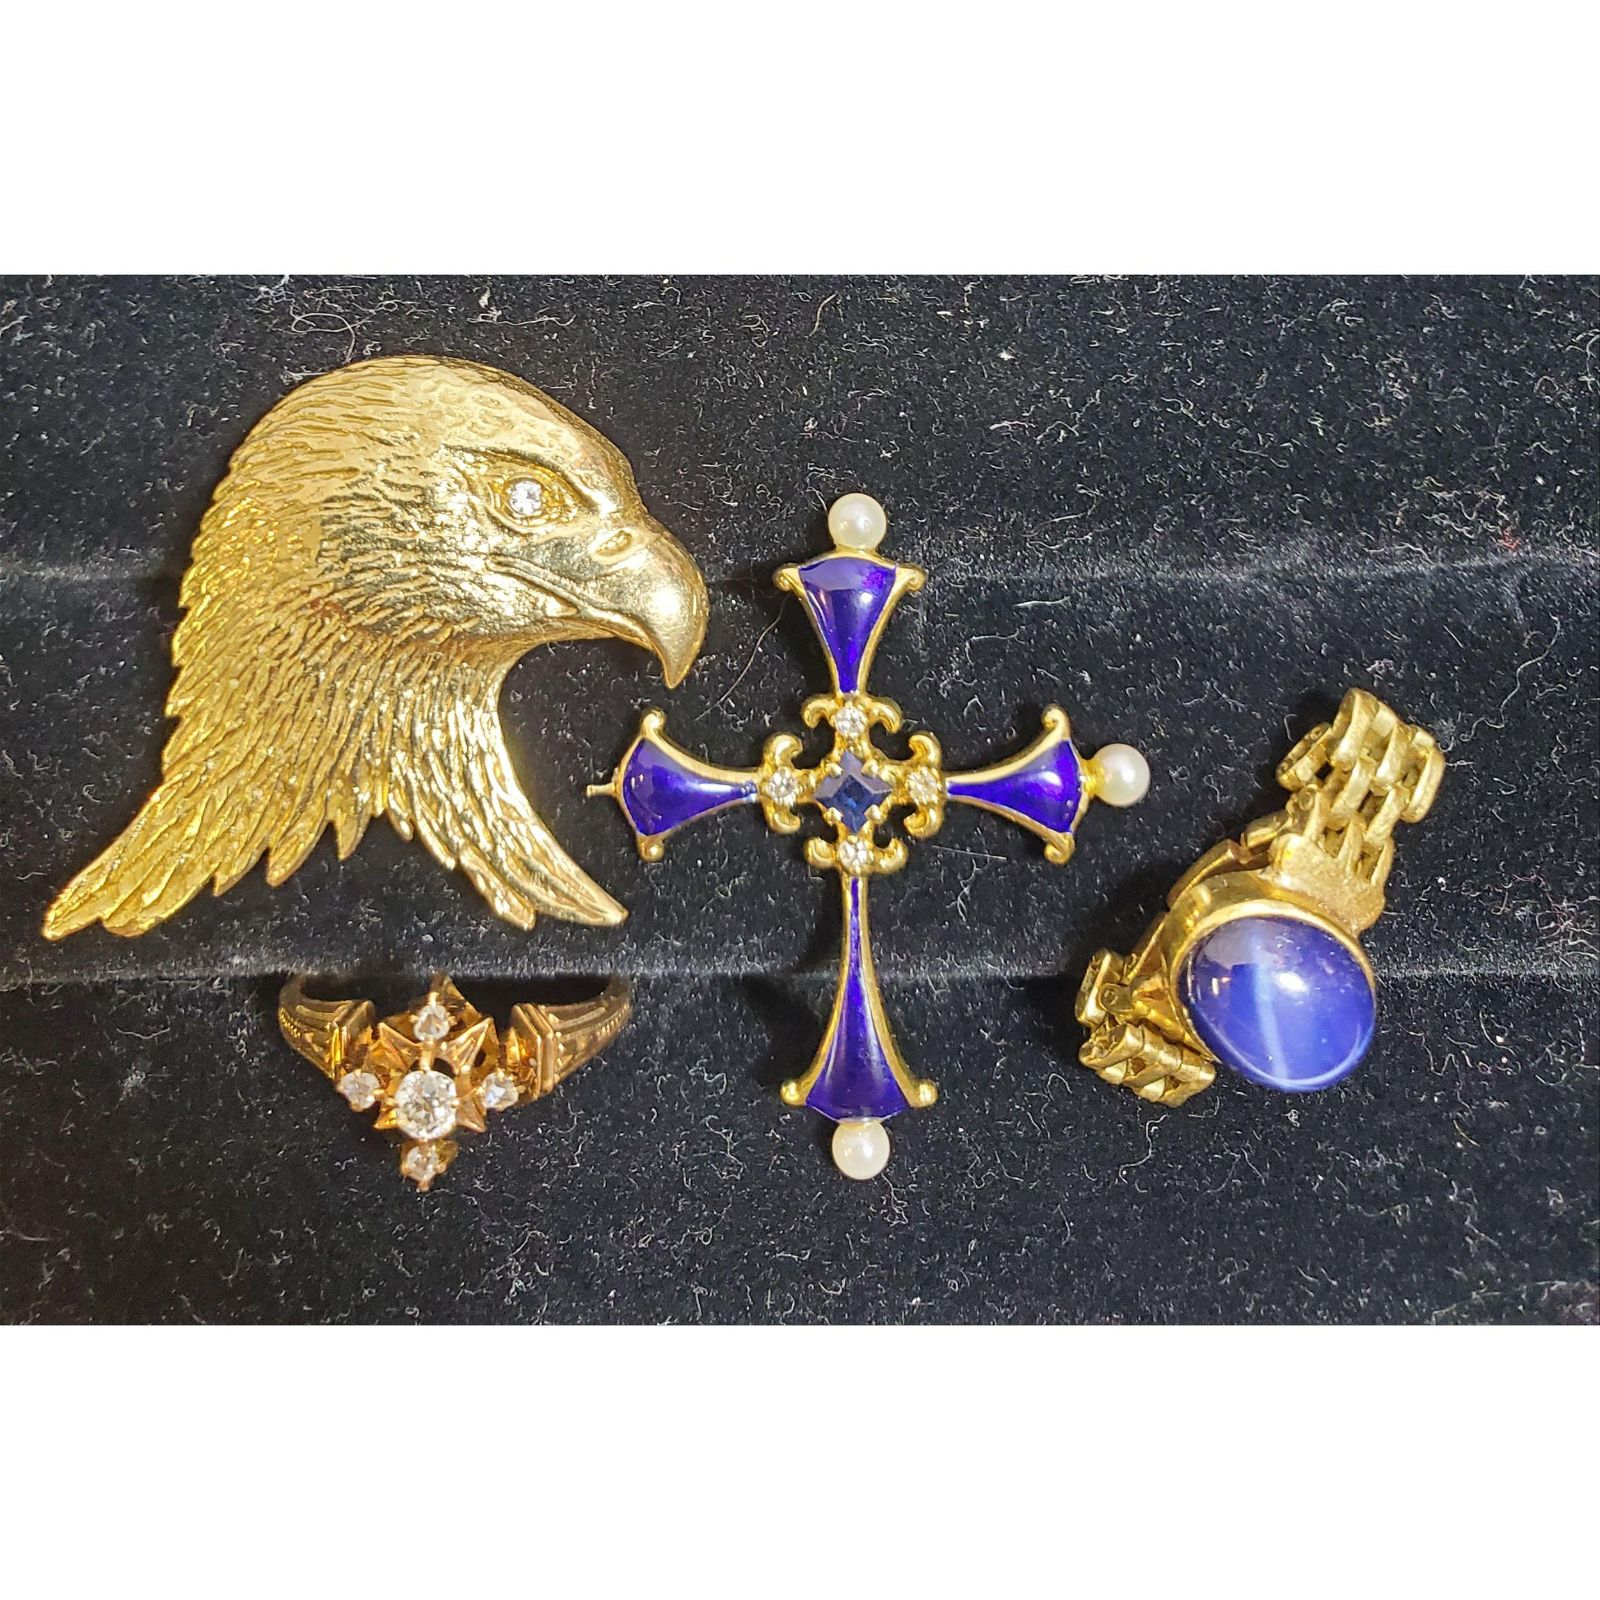 Estate Jewelry Lot 14K Gold, Diamond Ring, Sapphire